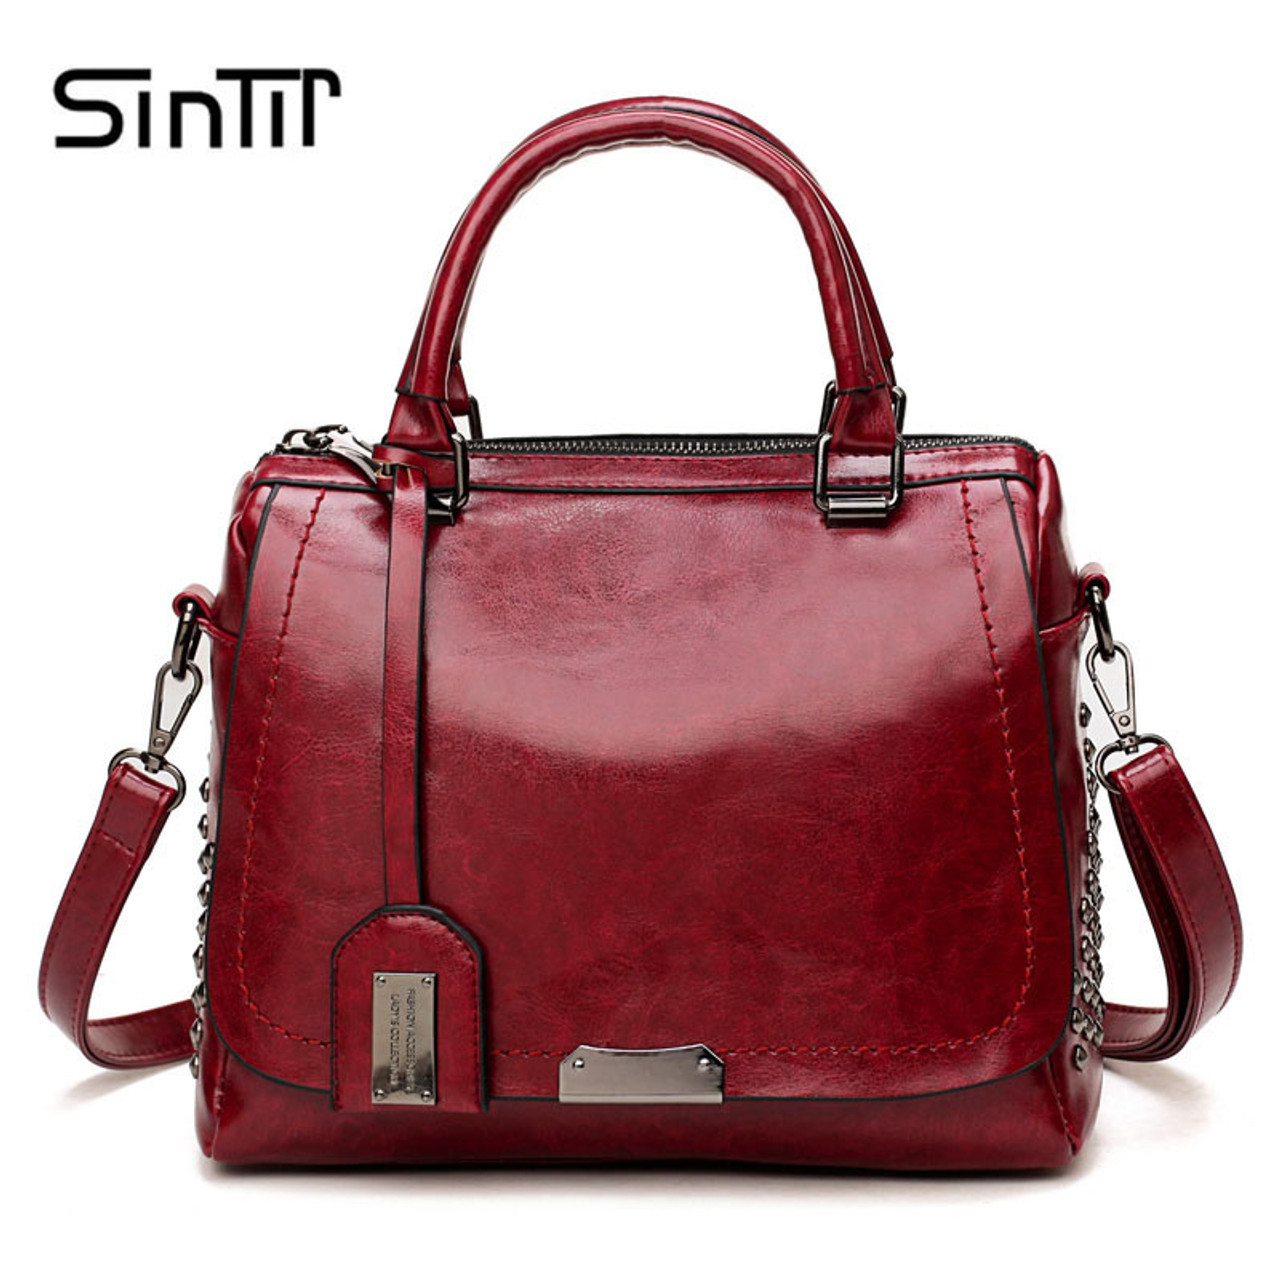 e42f6e3b2edf6d ... SINTIR Designer Brand Oil Wax Leather Women Handbags Fashion Rivet  Sequined Ladies Shoulder Bags Messenger Bag ...